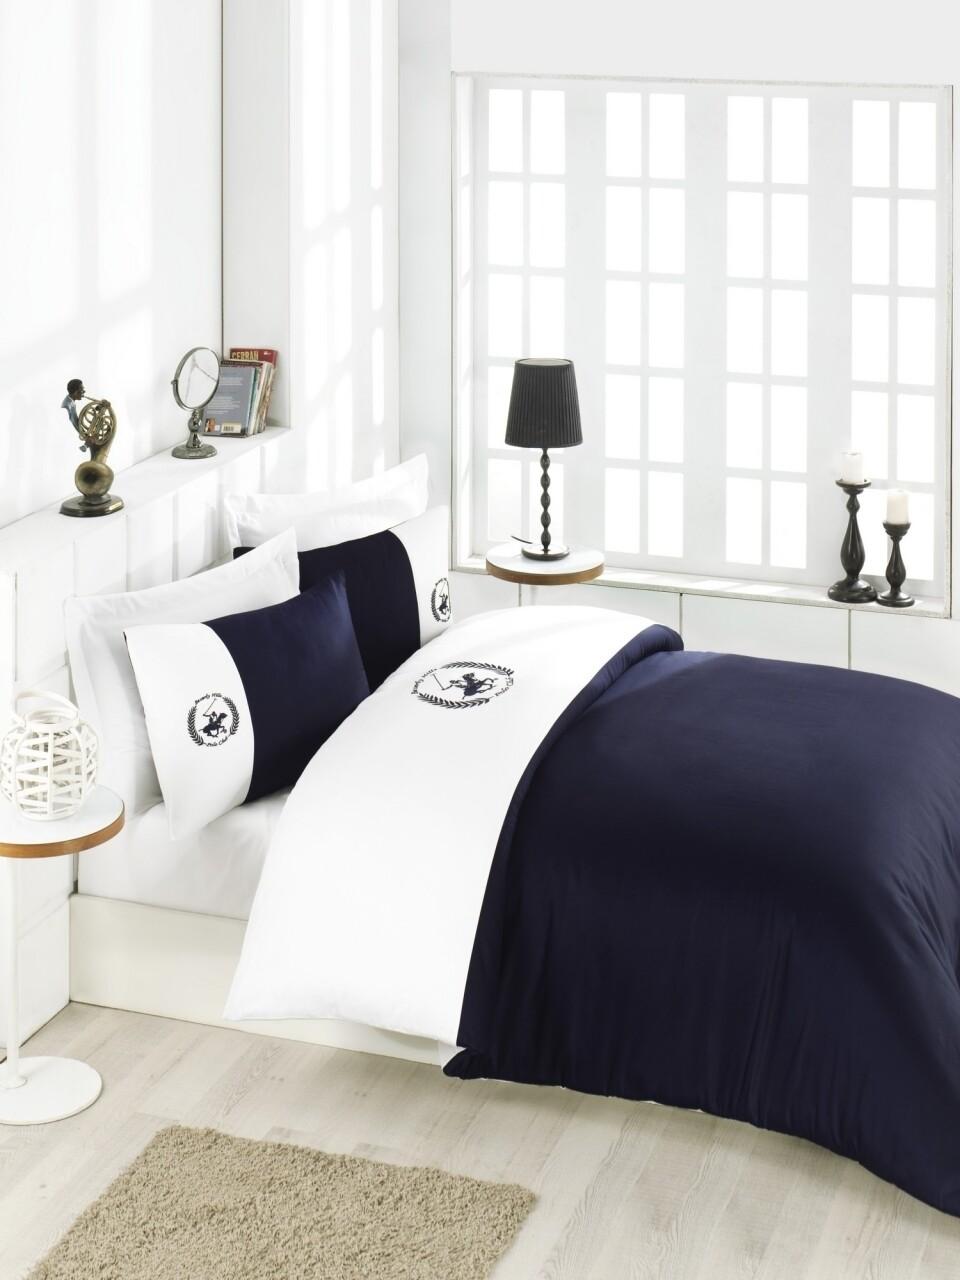 Lenjerie de pat dubla White Dreams, Beverly Hills Polo Club, 4 piese, 240 x 260 cm, 100% bumbac satinat, alb/bleumarin